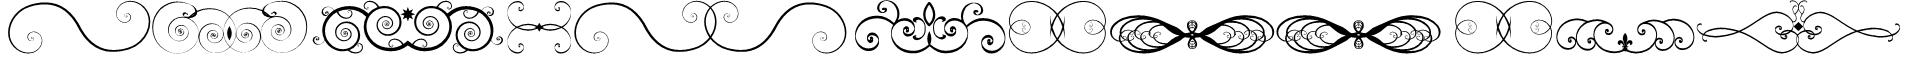 Ornametss tfb Font